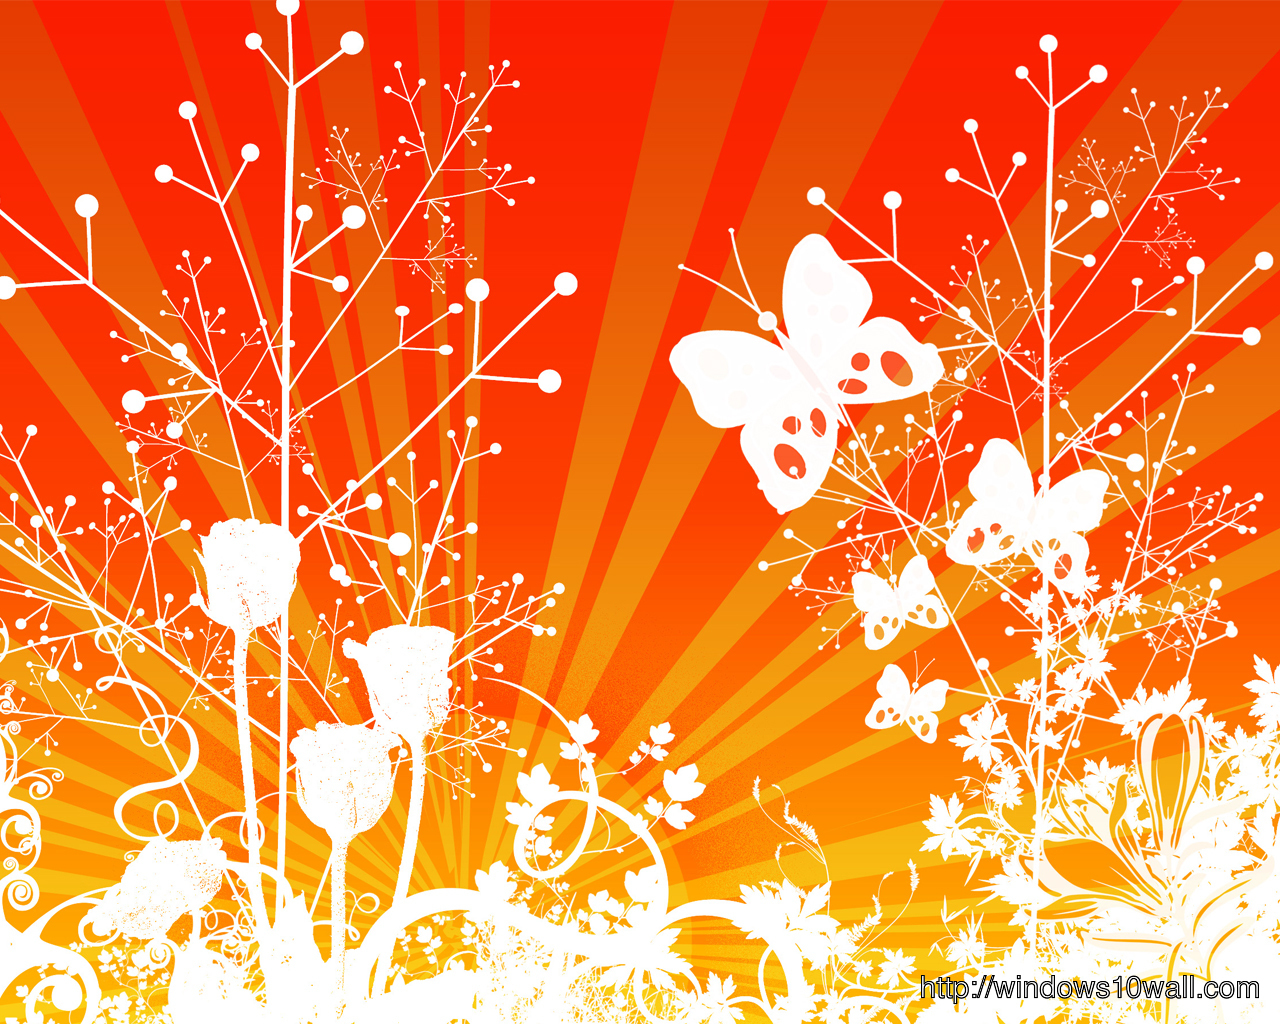 abstract-Background-Wallpaper-vector-orange